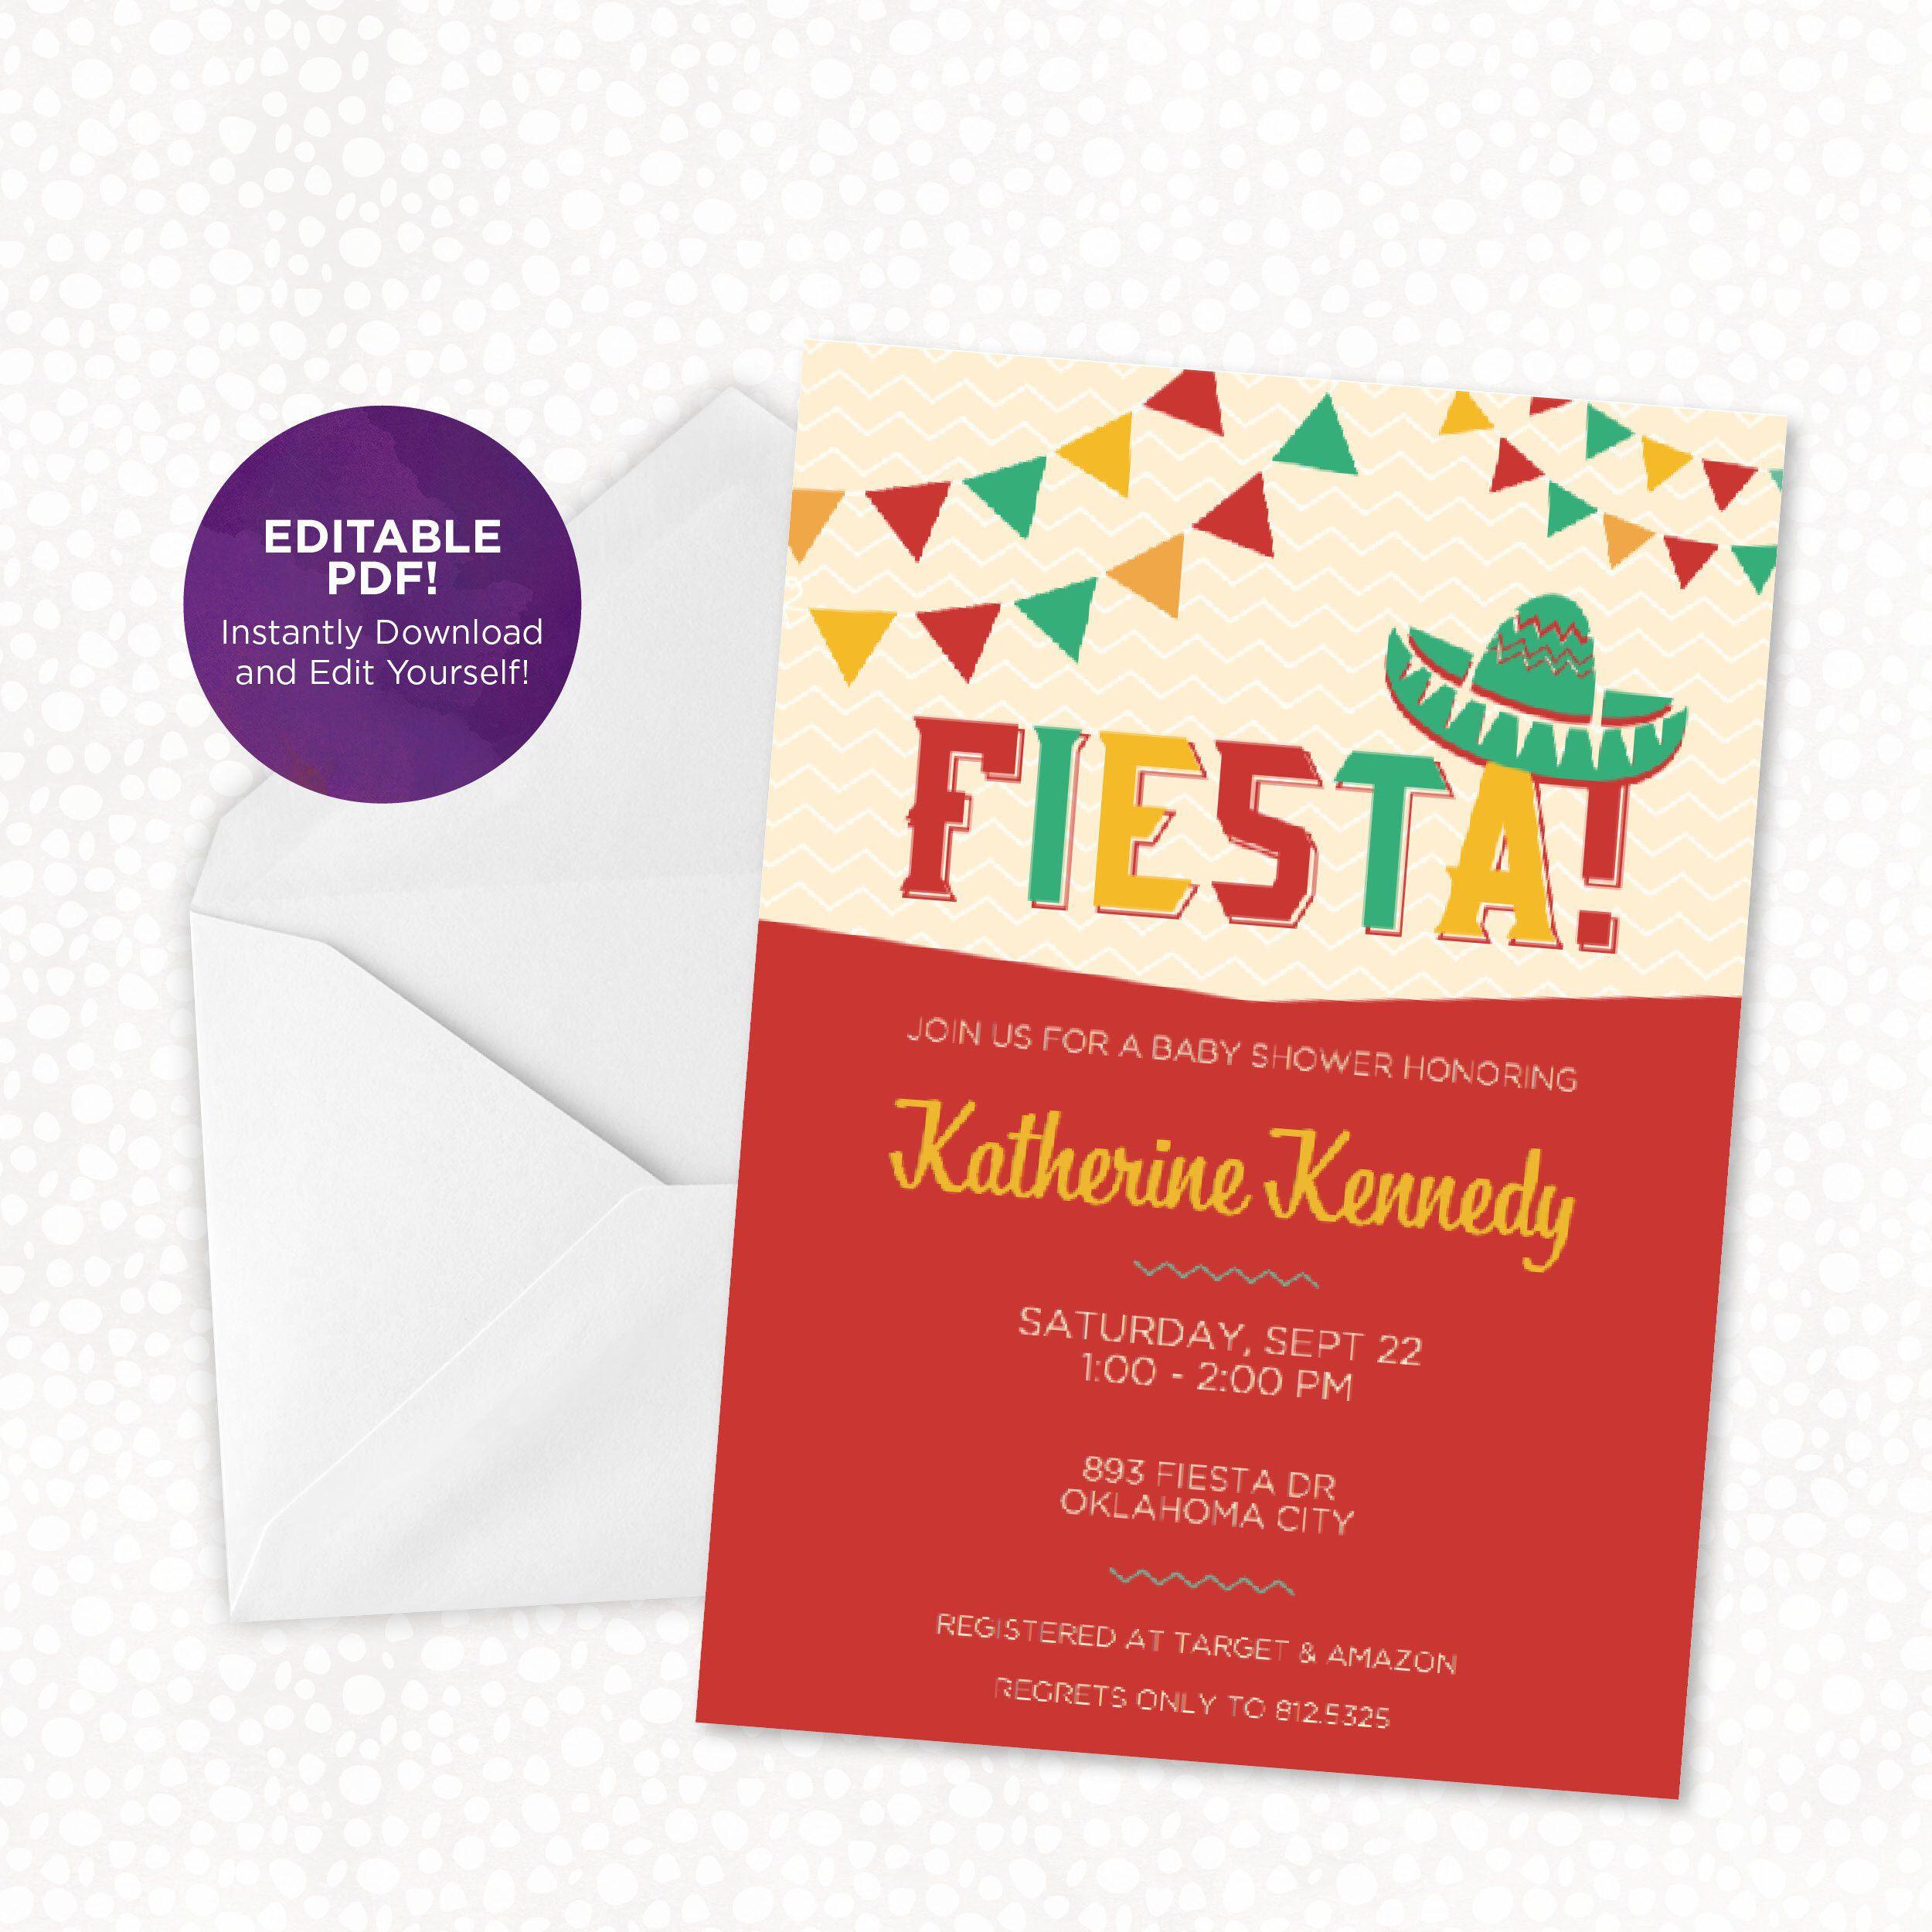 Fiesta Party Invitation, Baby Shower, Birthday, Fiesta Party | Baby ...